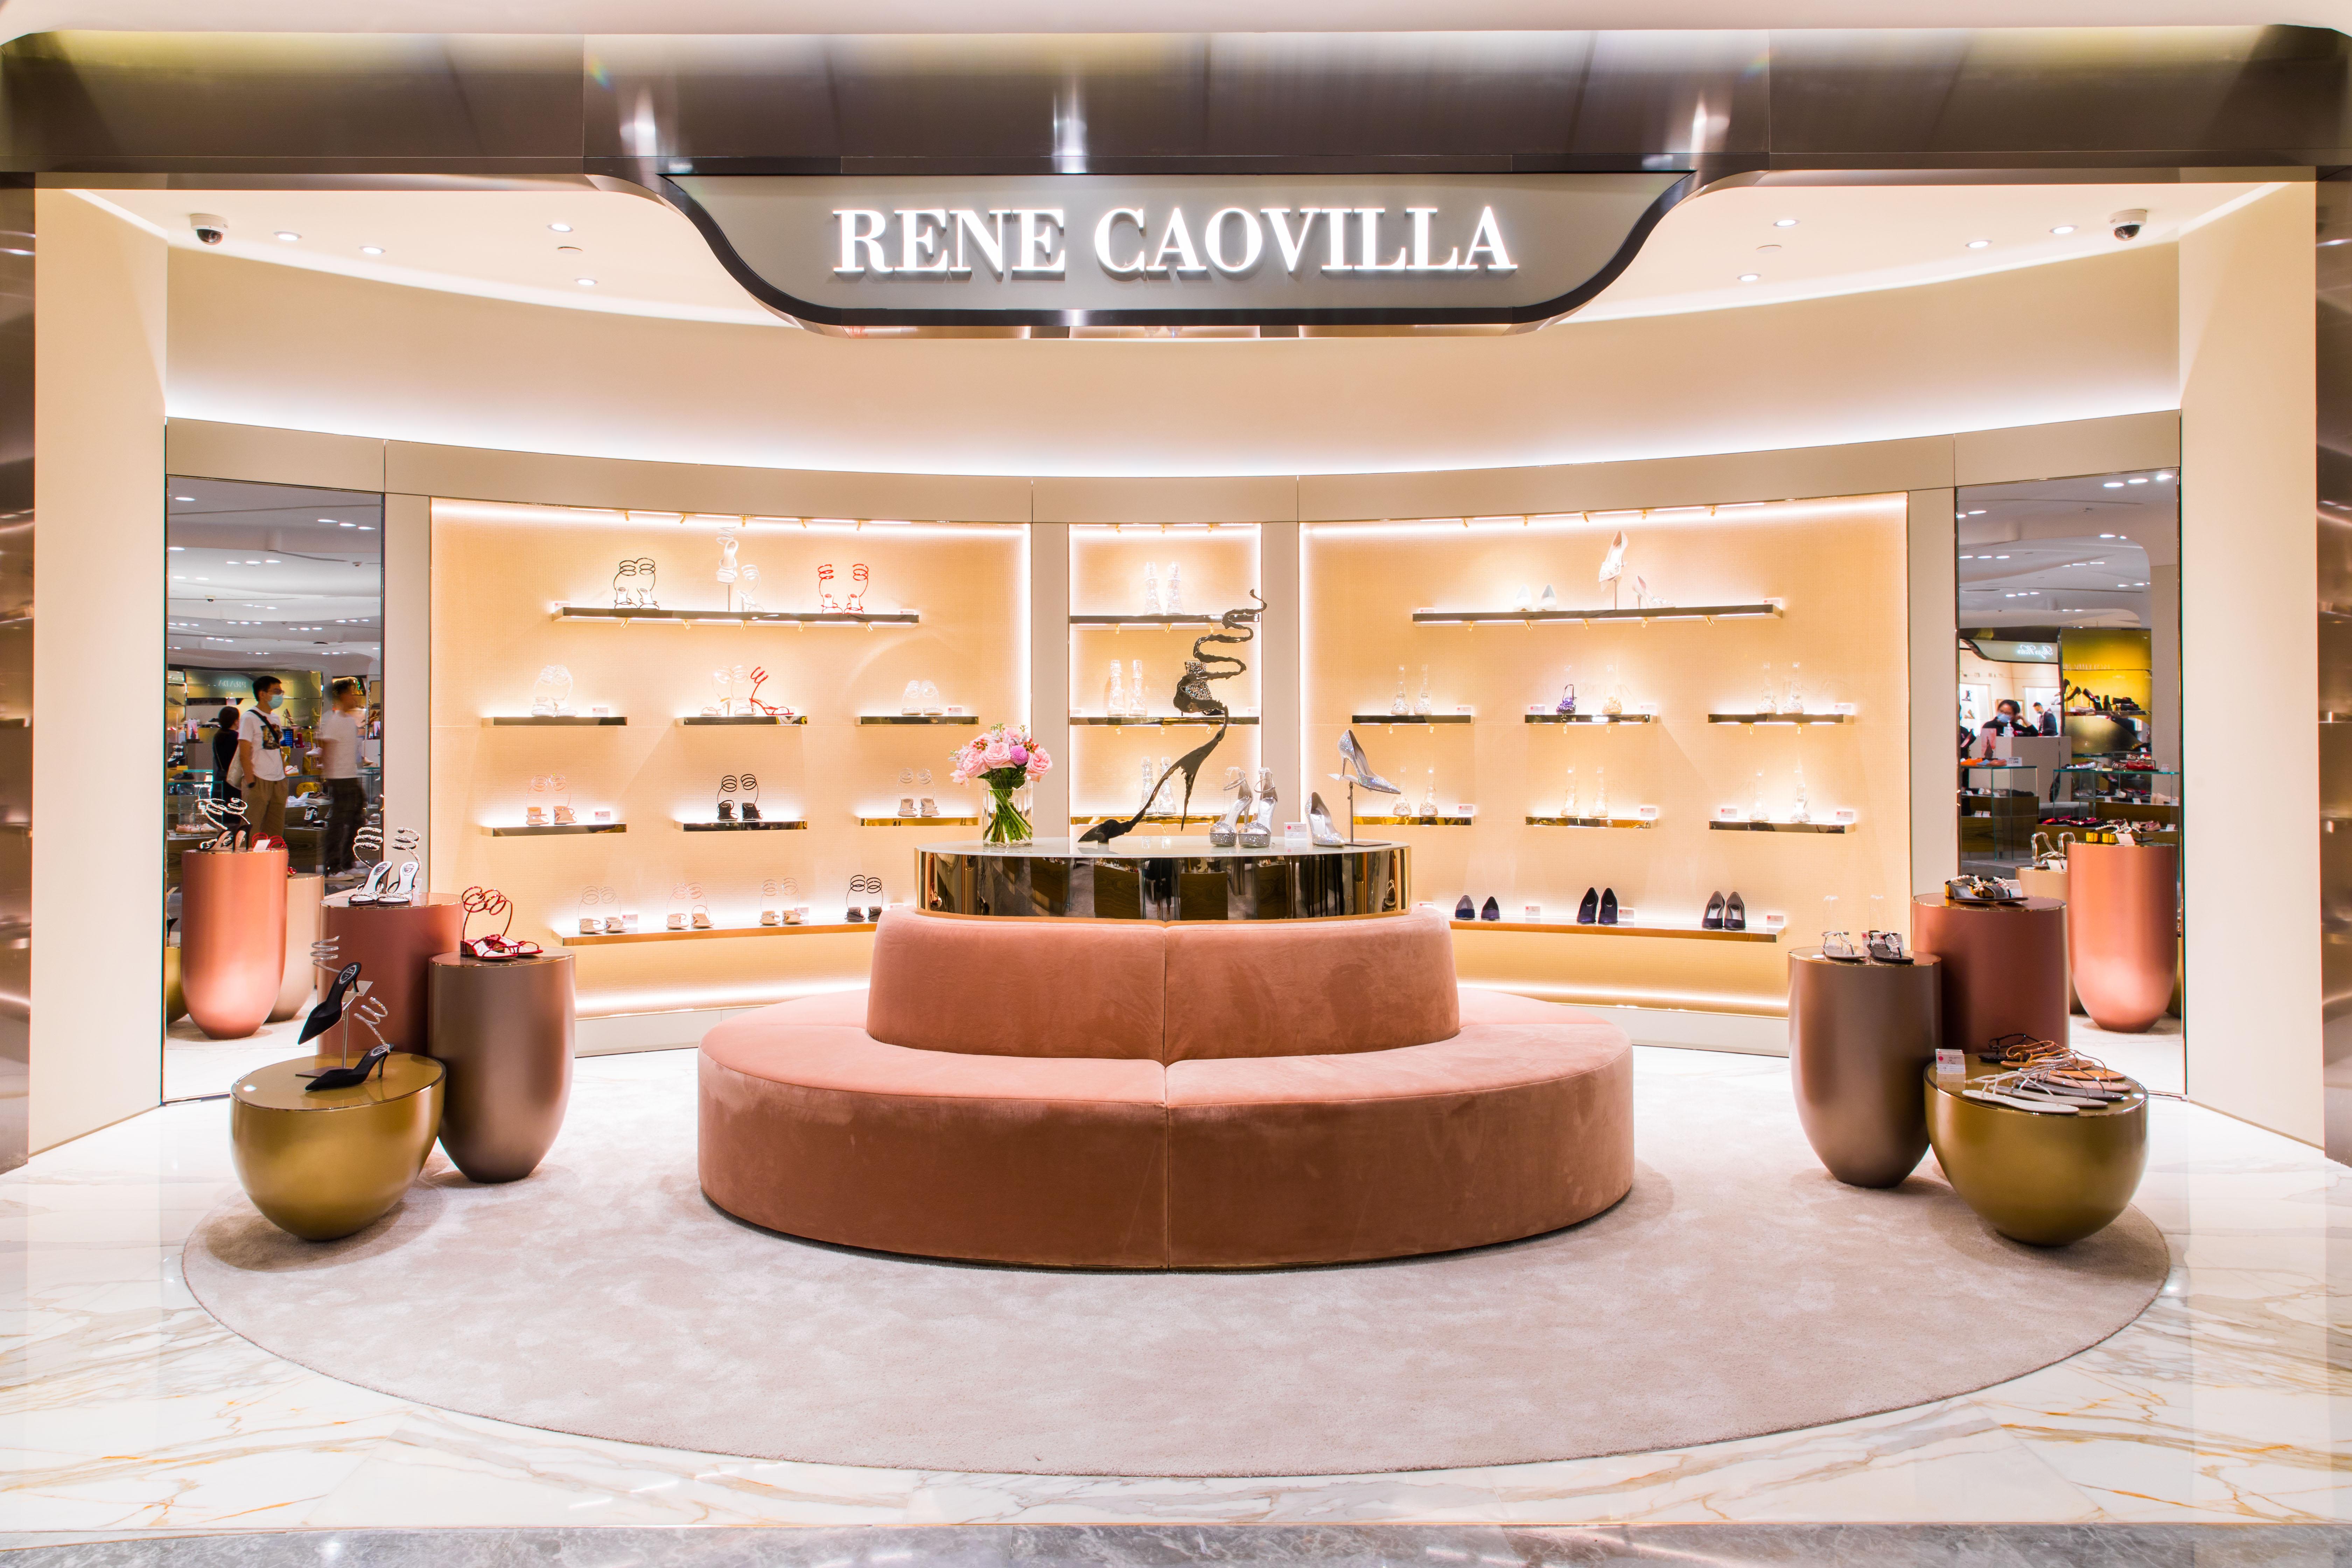 René Caovilla new store at SKP in Beijing